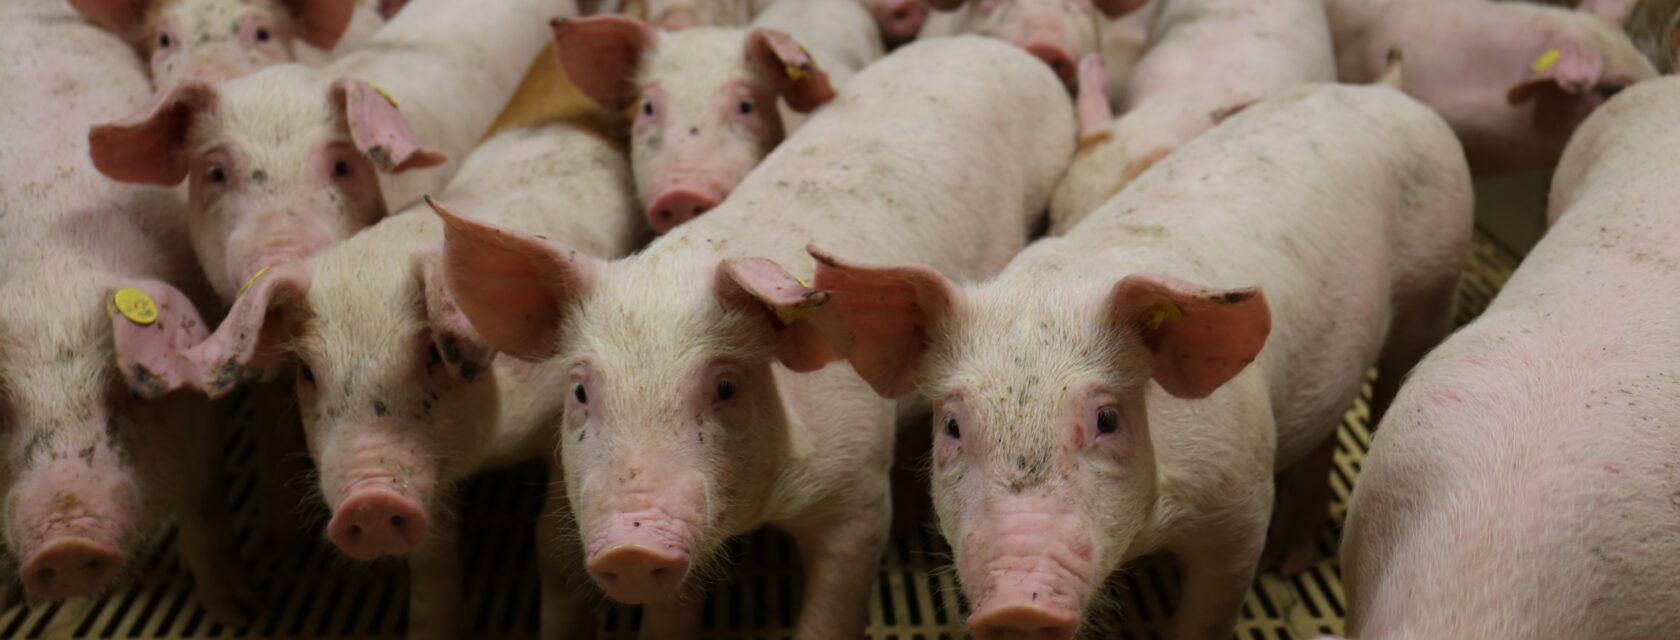 beeld varkens in vee-industrie